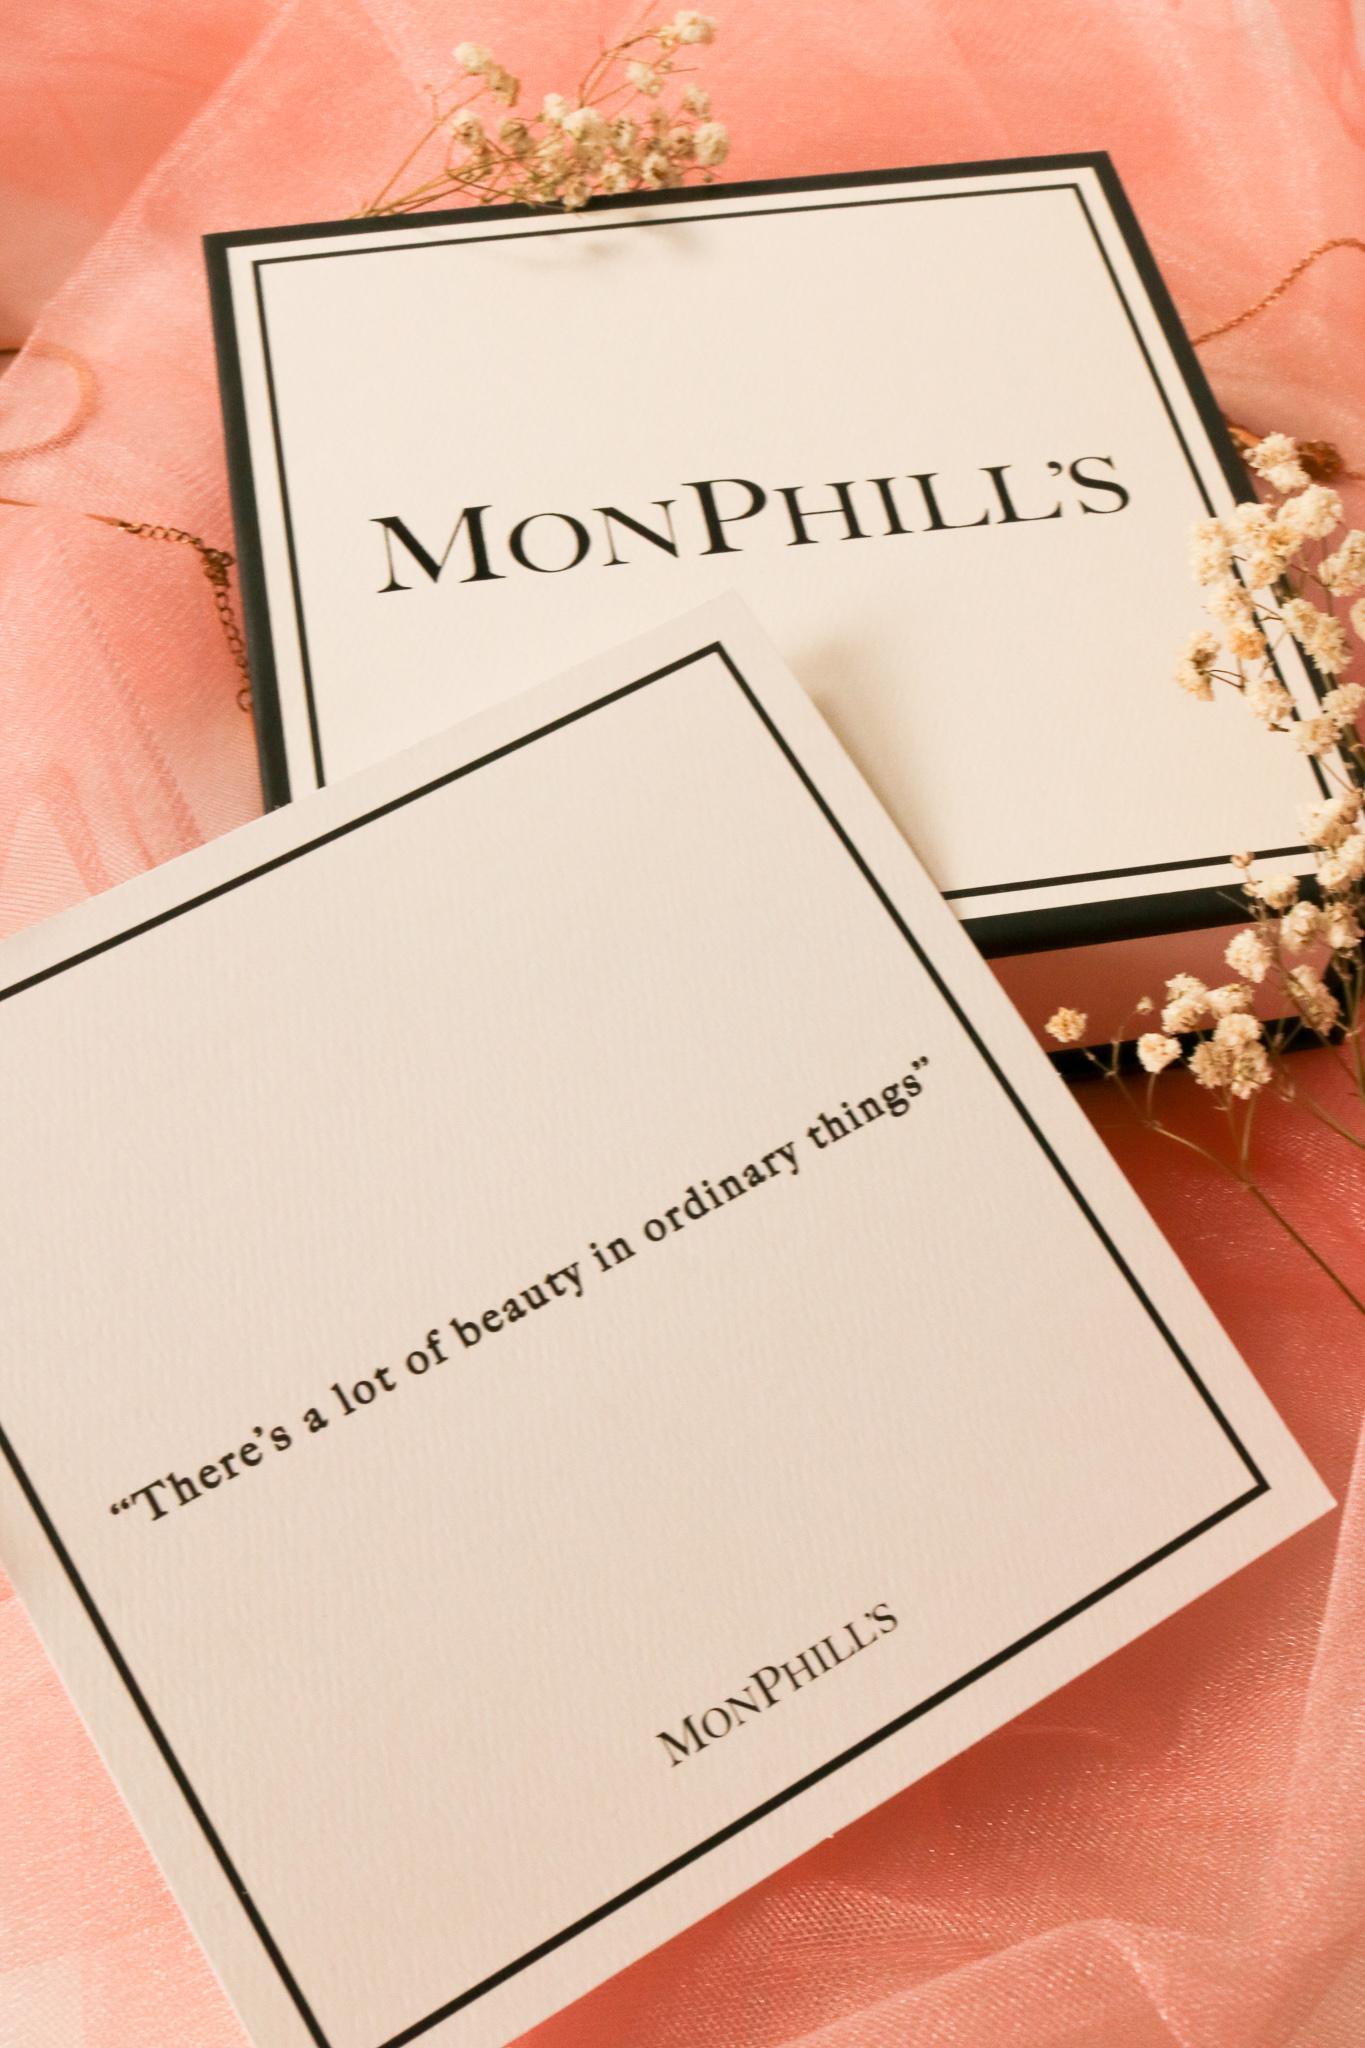 MonPhill's